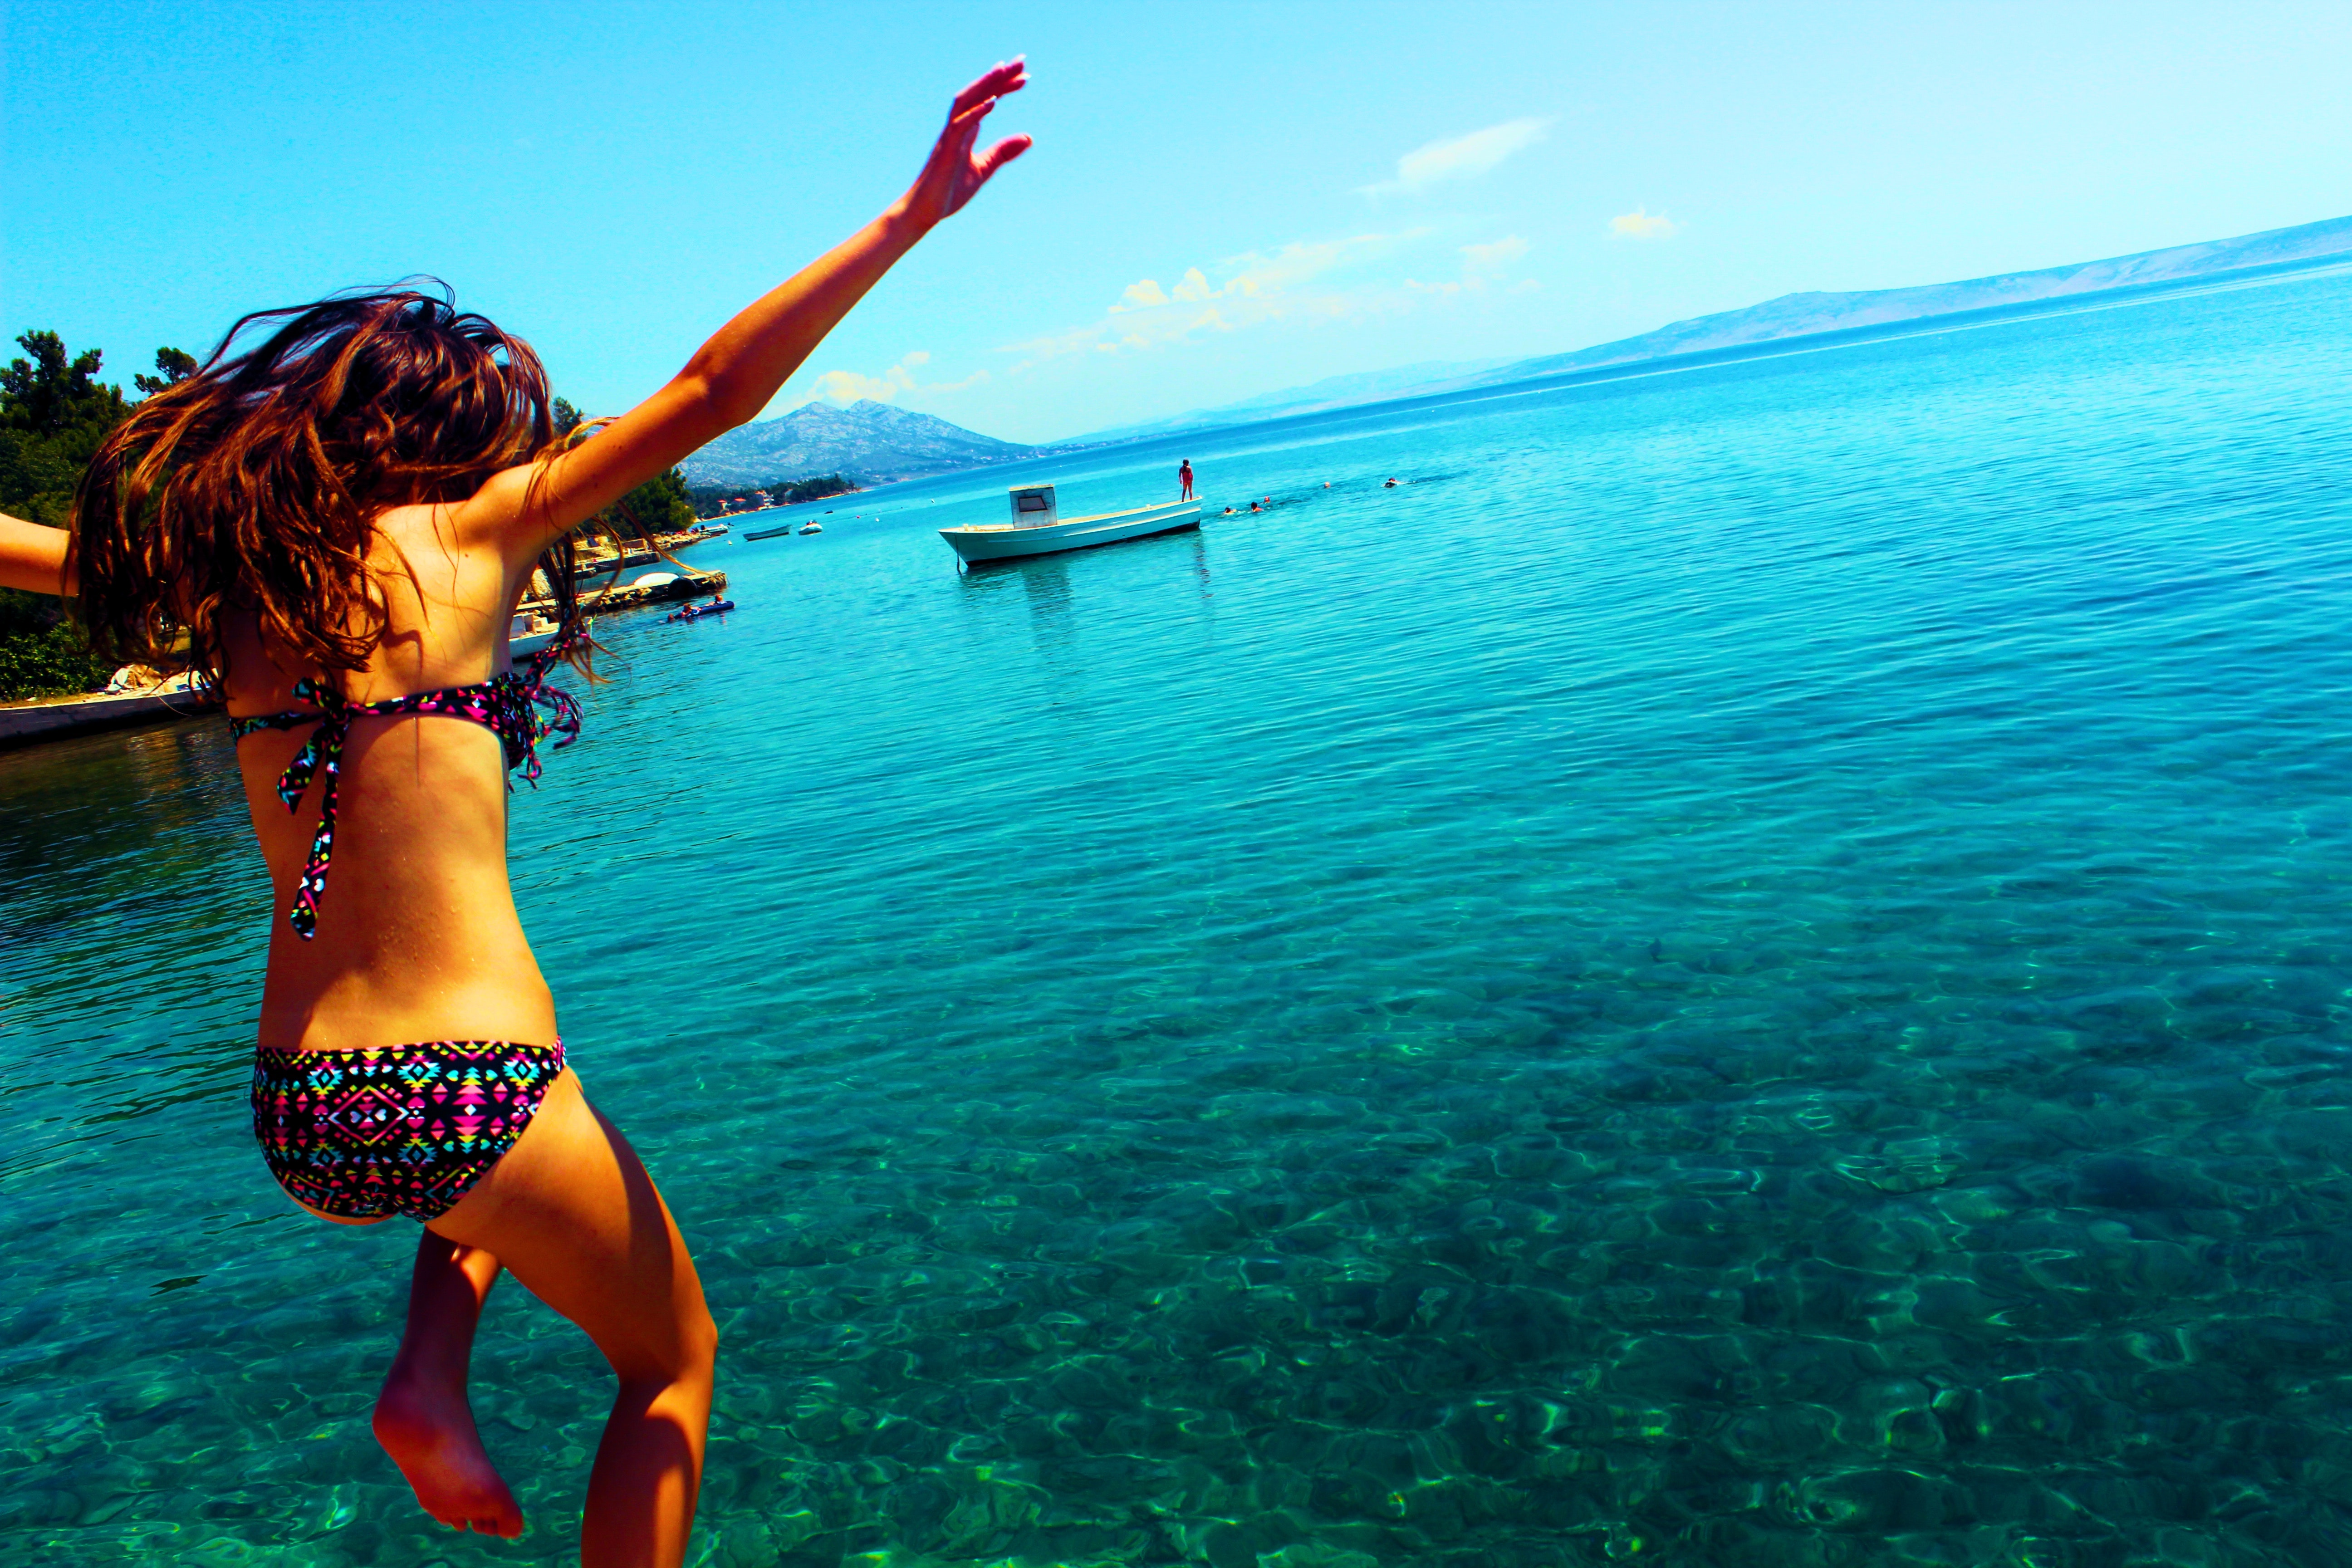 Woman Wearing Bikini Jumping to the Beach, Adventure, Sea, Weekend, Water, HQ Photo